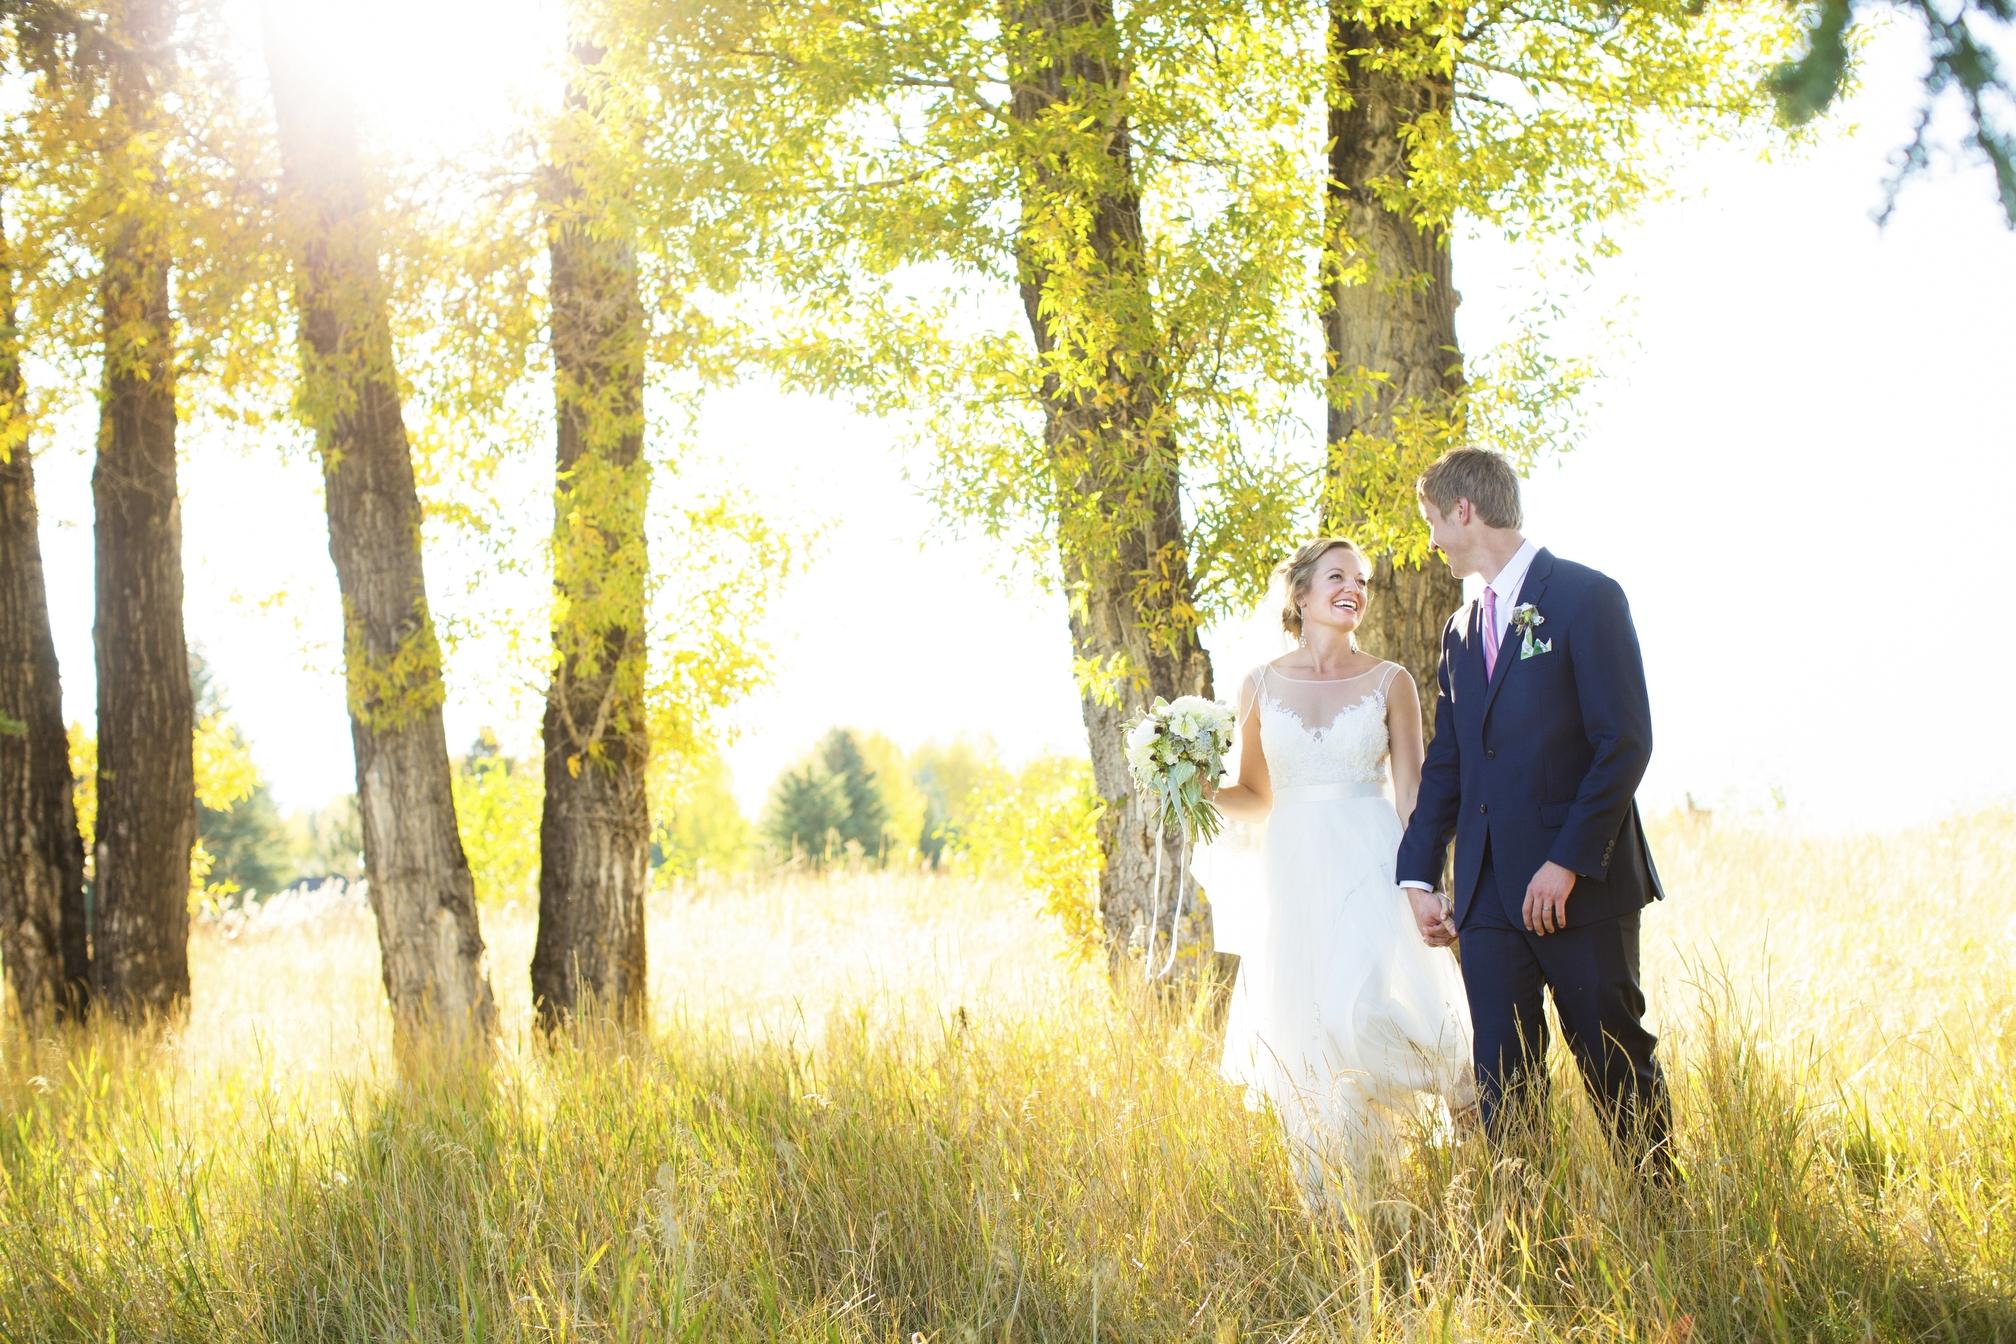 Millett Wedding Jackson Hole 2104_0319A.JPG